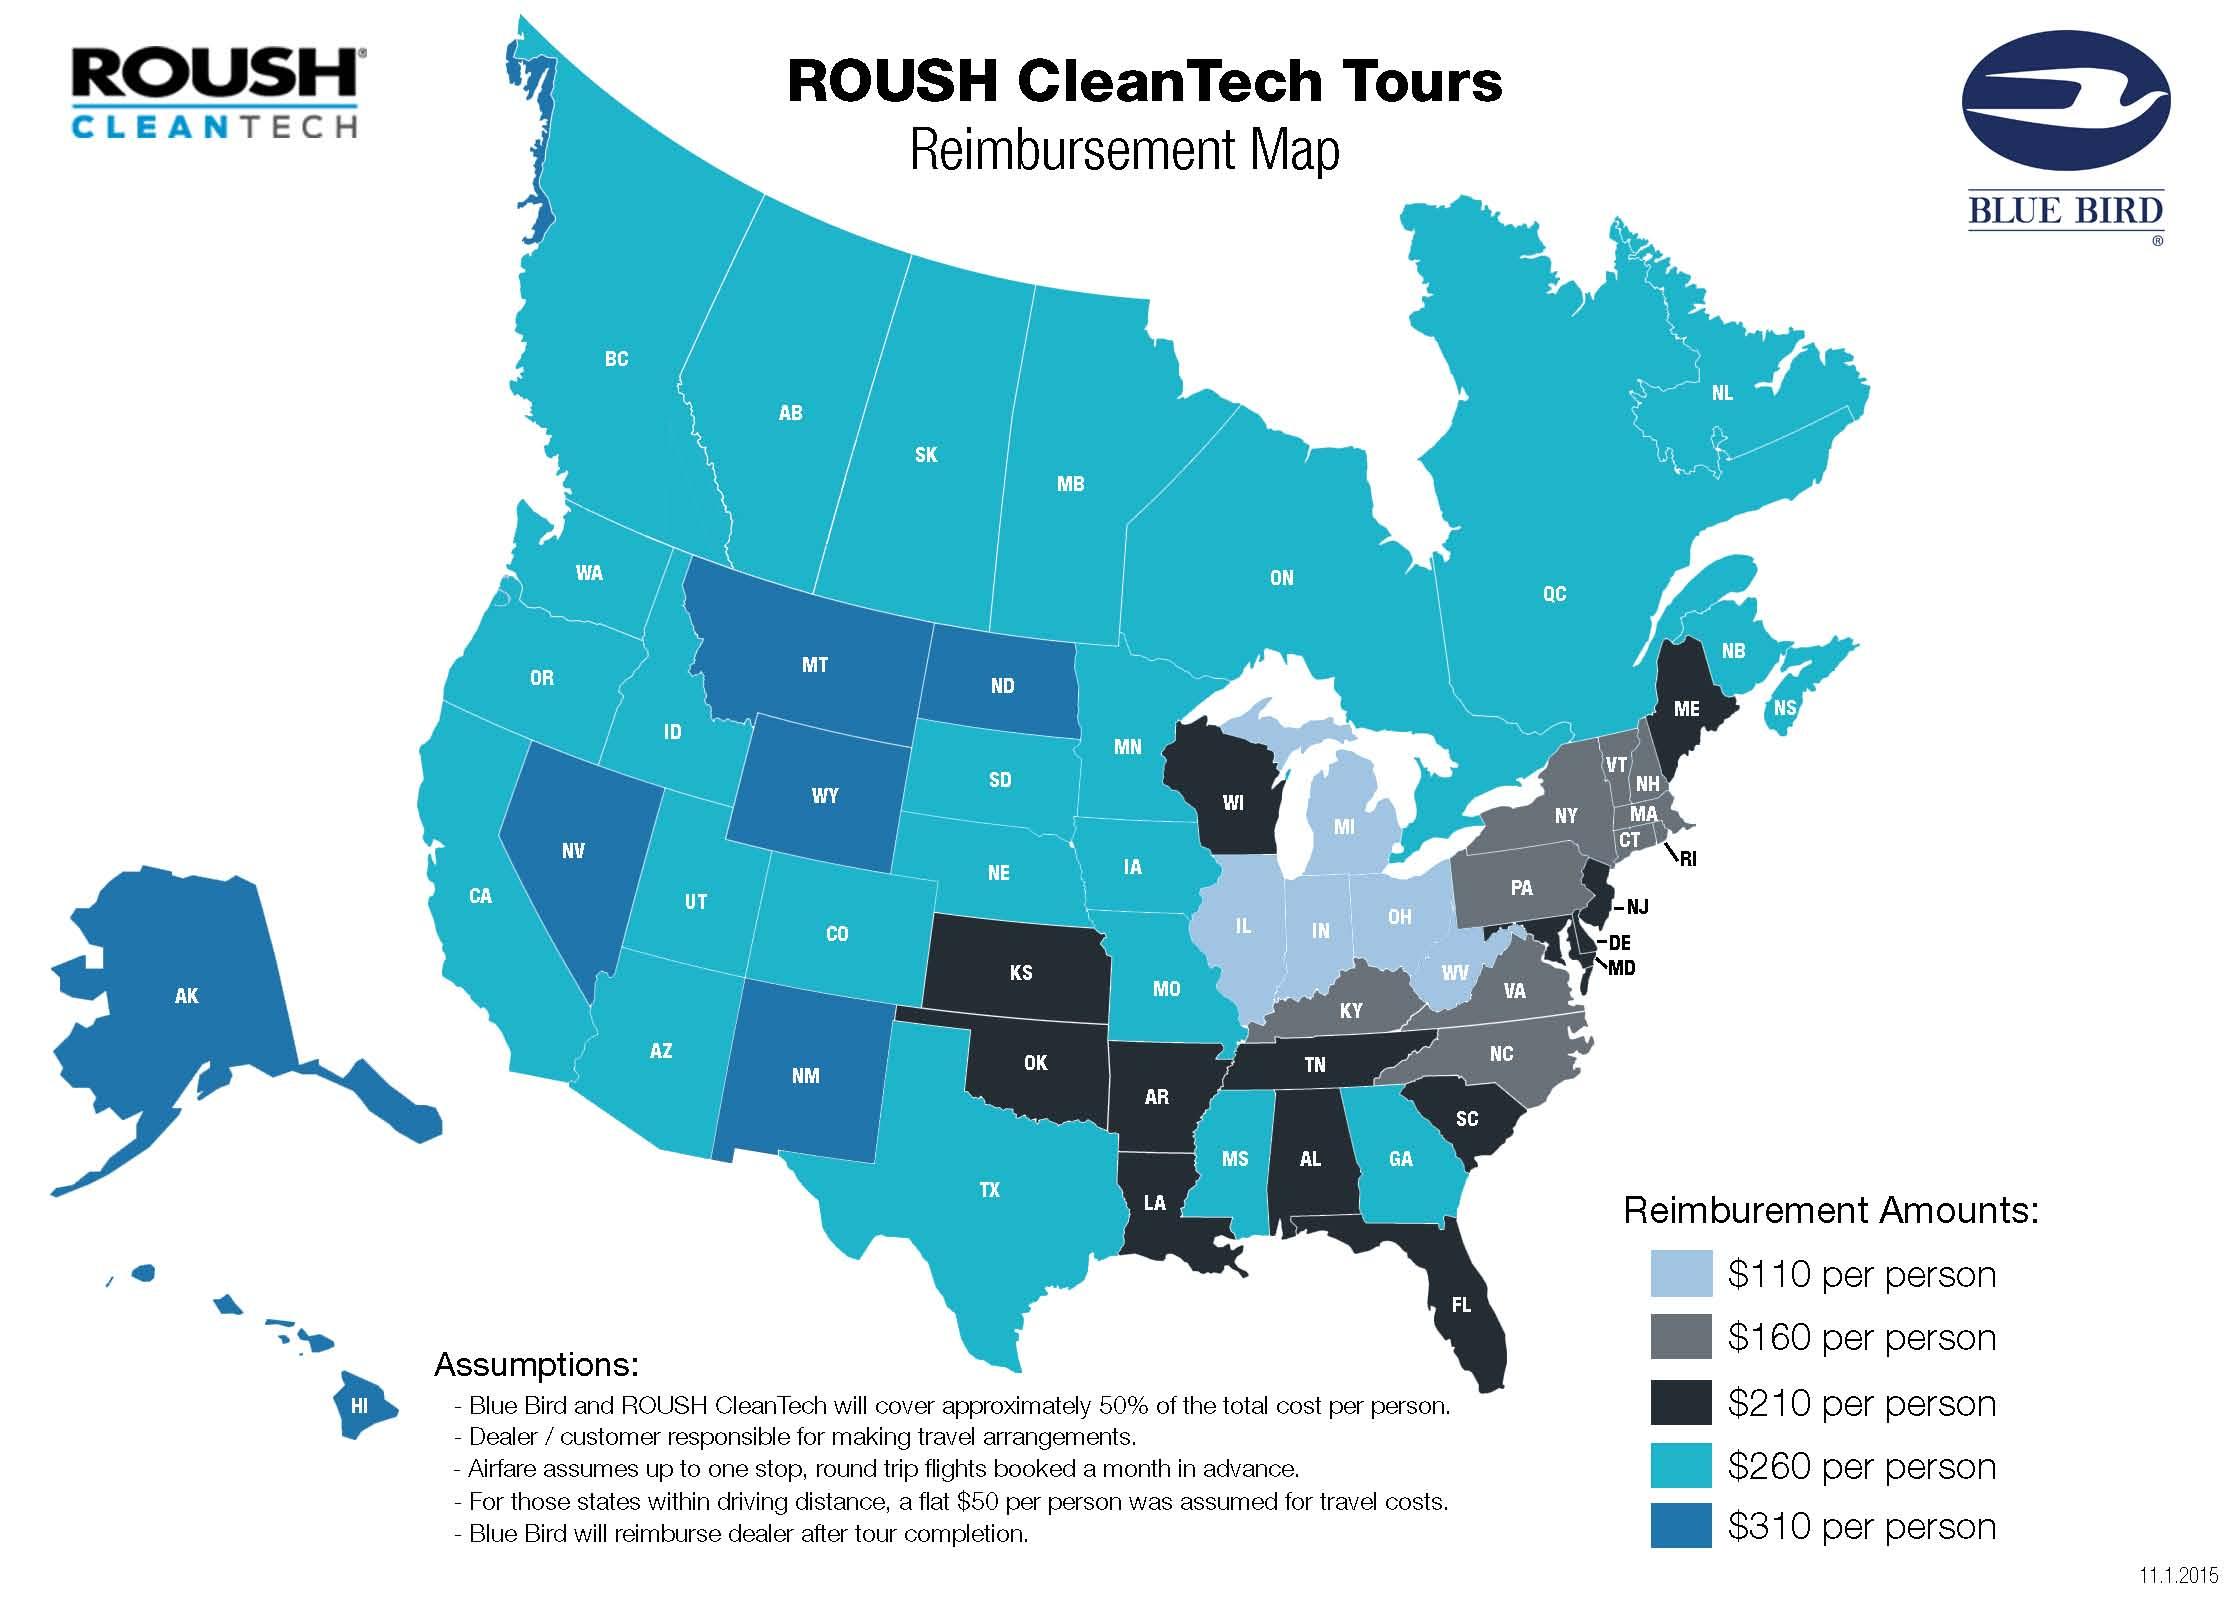 Tour Reimbursement Map (11.11.15)